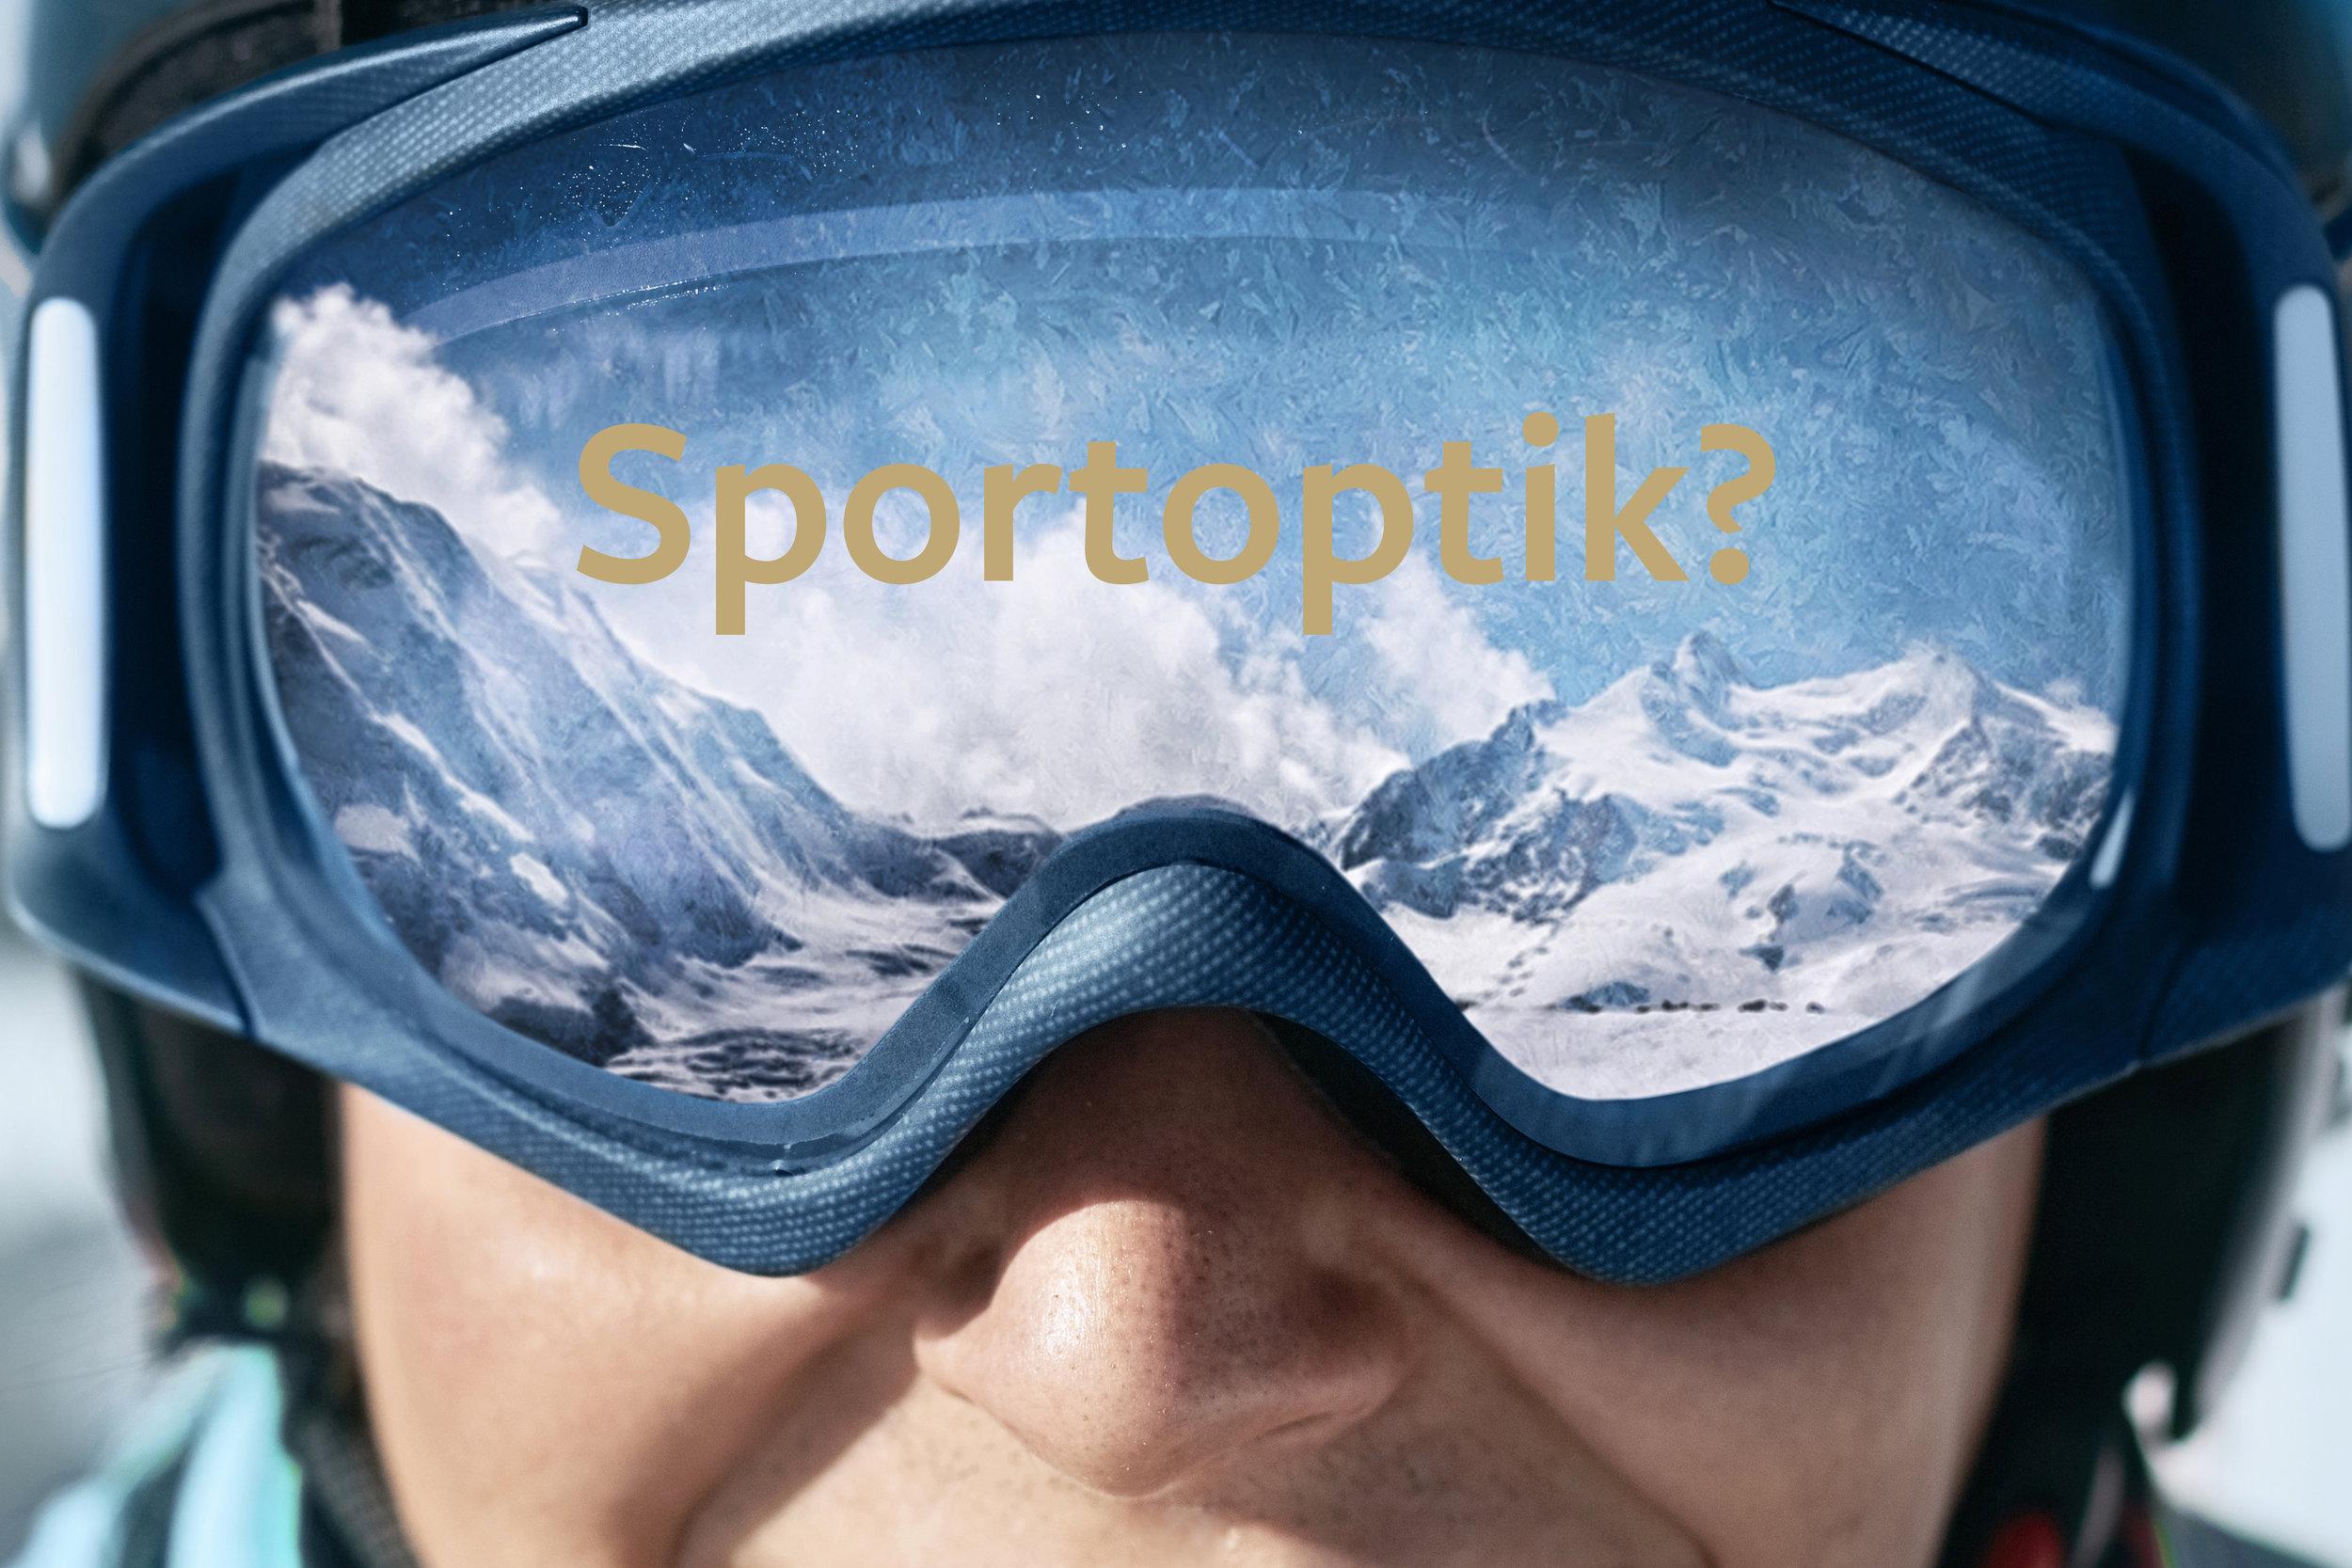 Sportoptik-Seminar_Augenoptiker_Skibrille.jpg